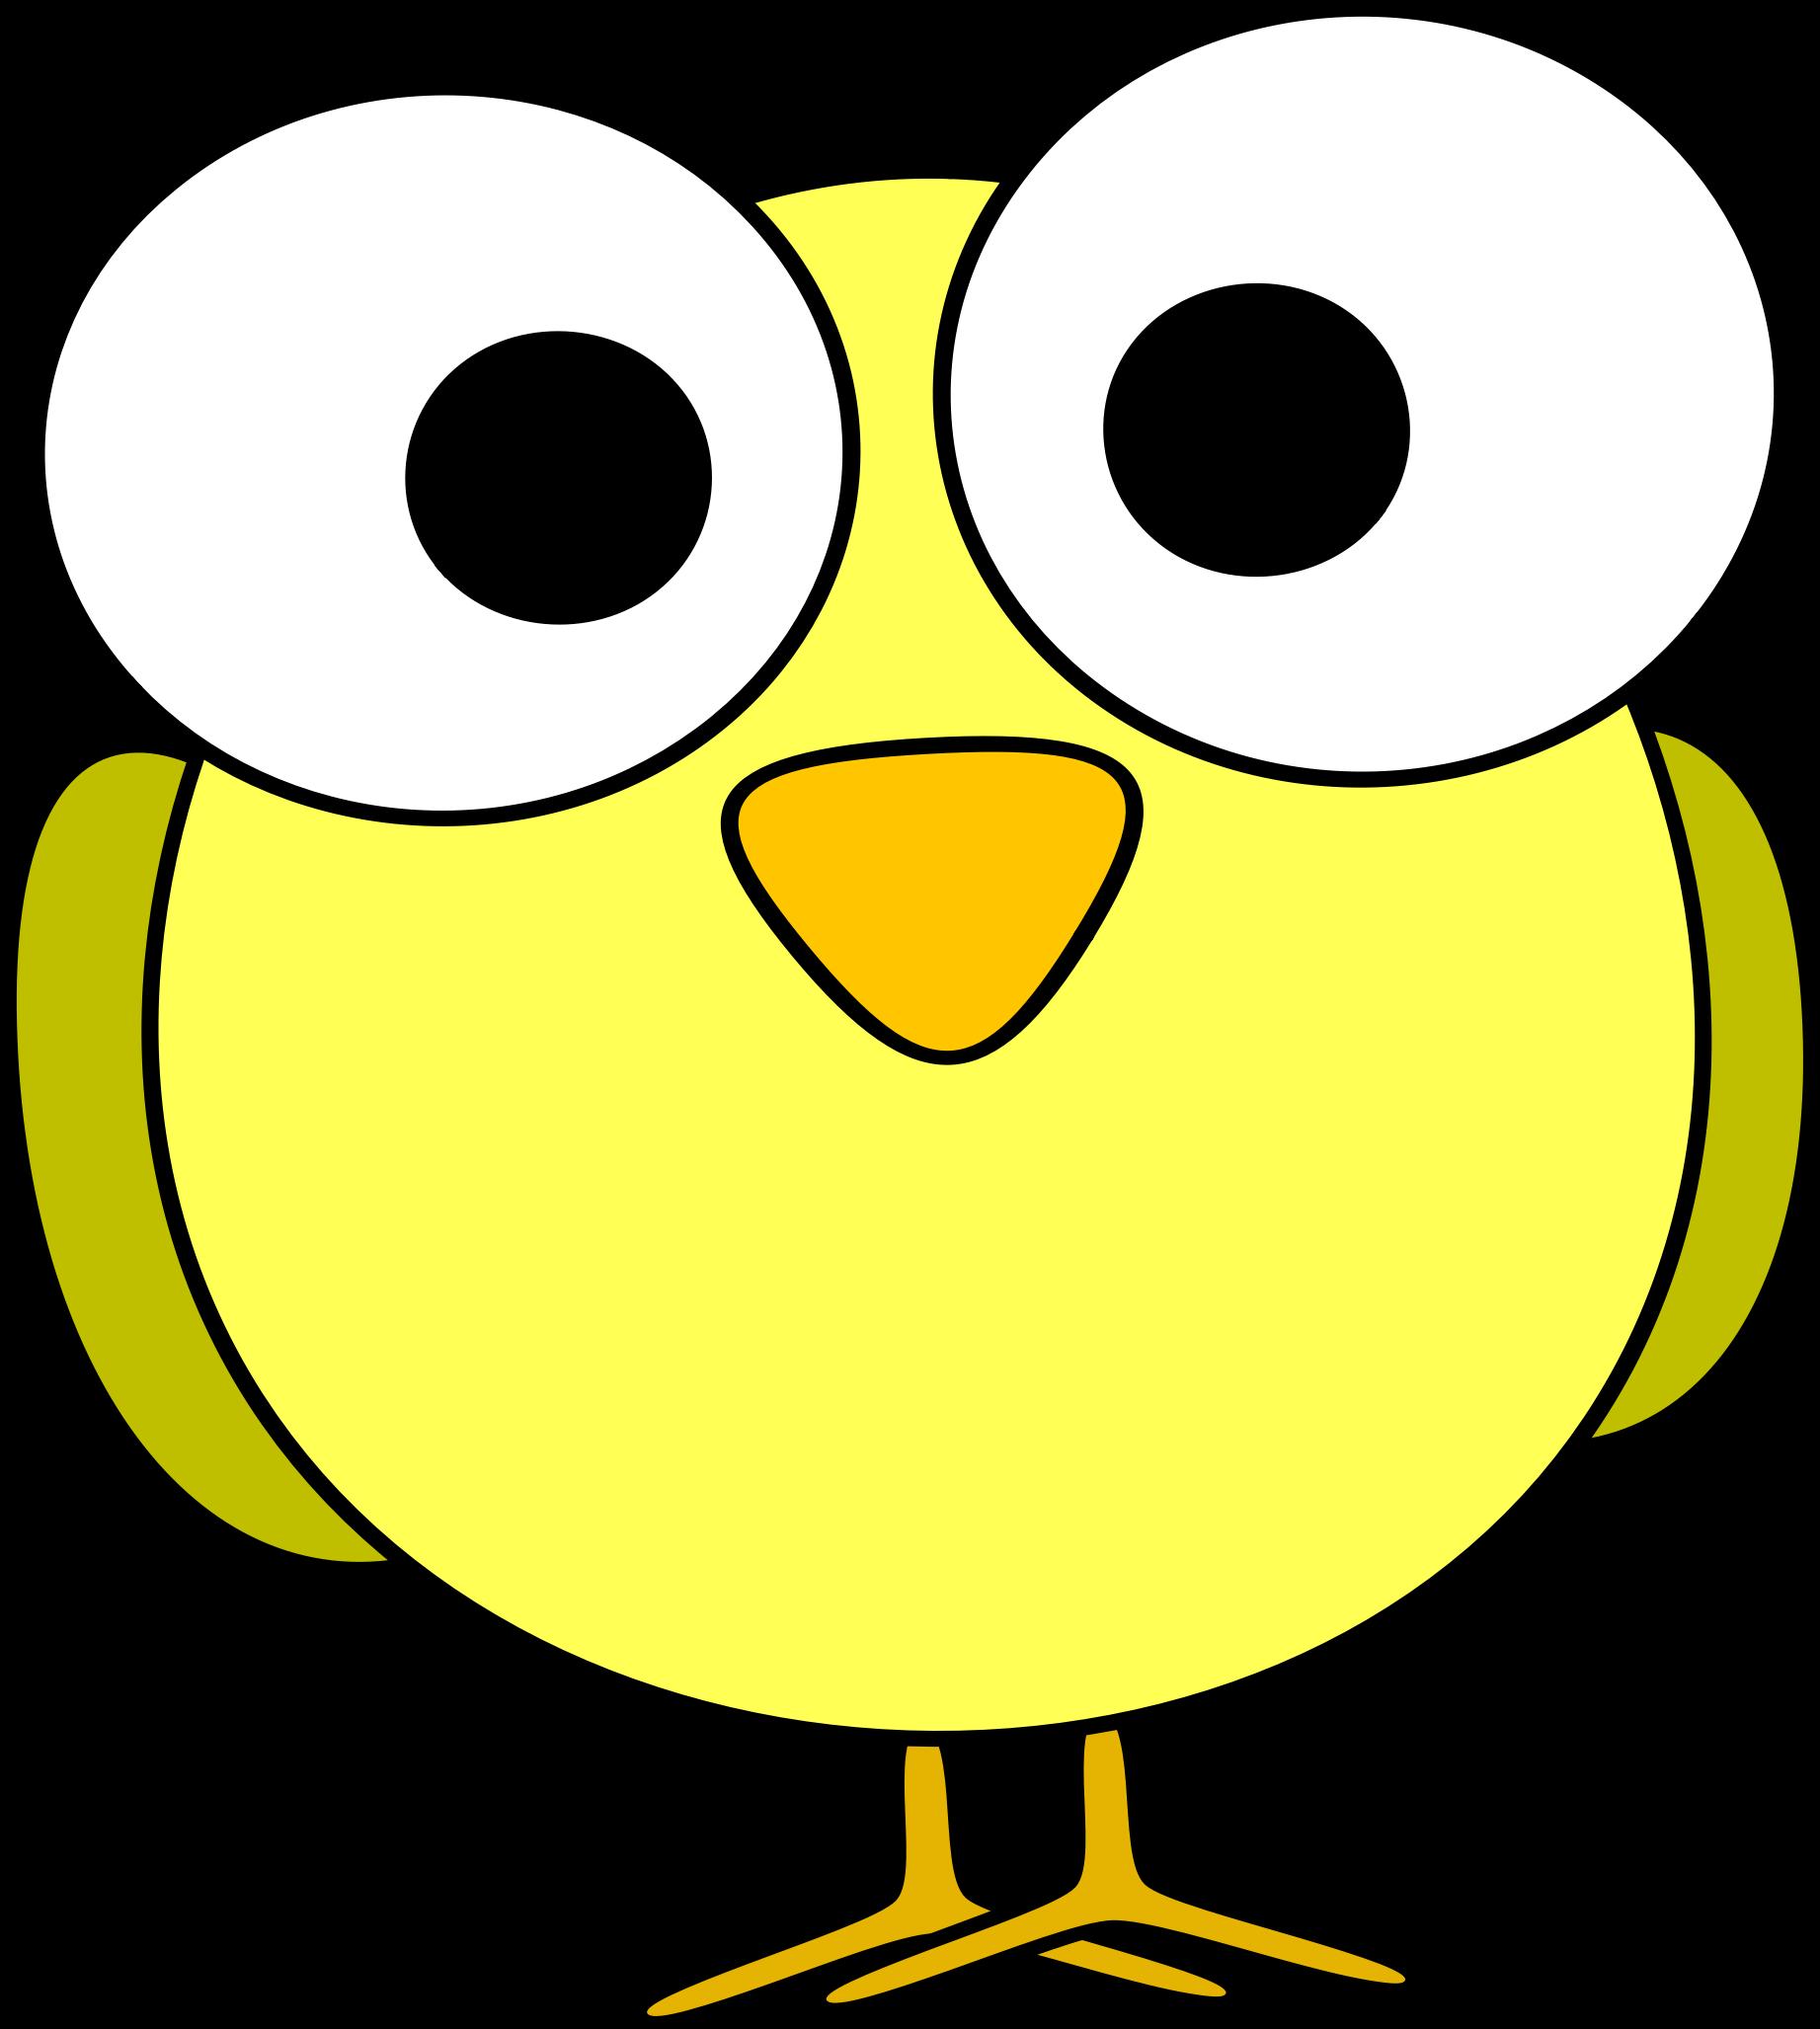 A funny looking yellow. Head clipart big bird